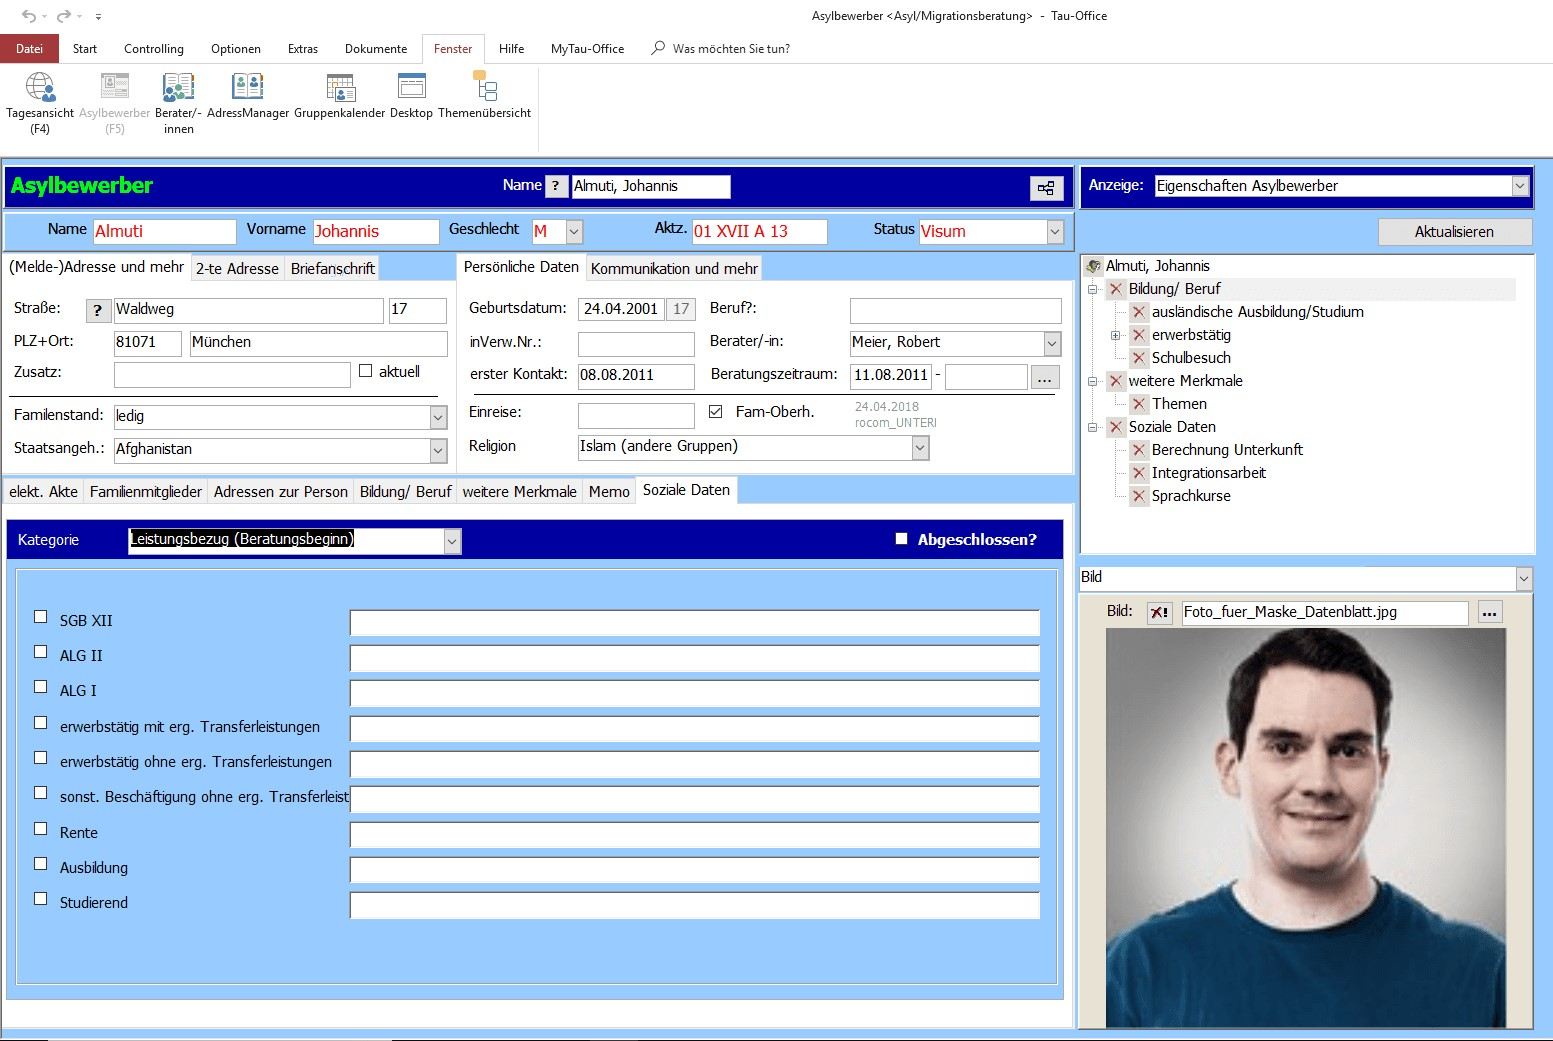 Asylbewerberakte und Soziale Daten Tau-Office Asyl/Migrantenberatung